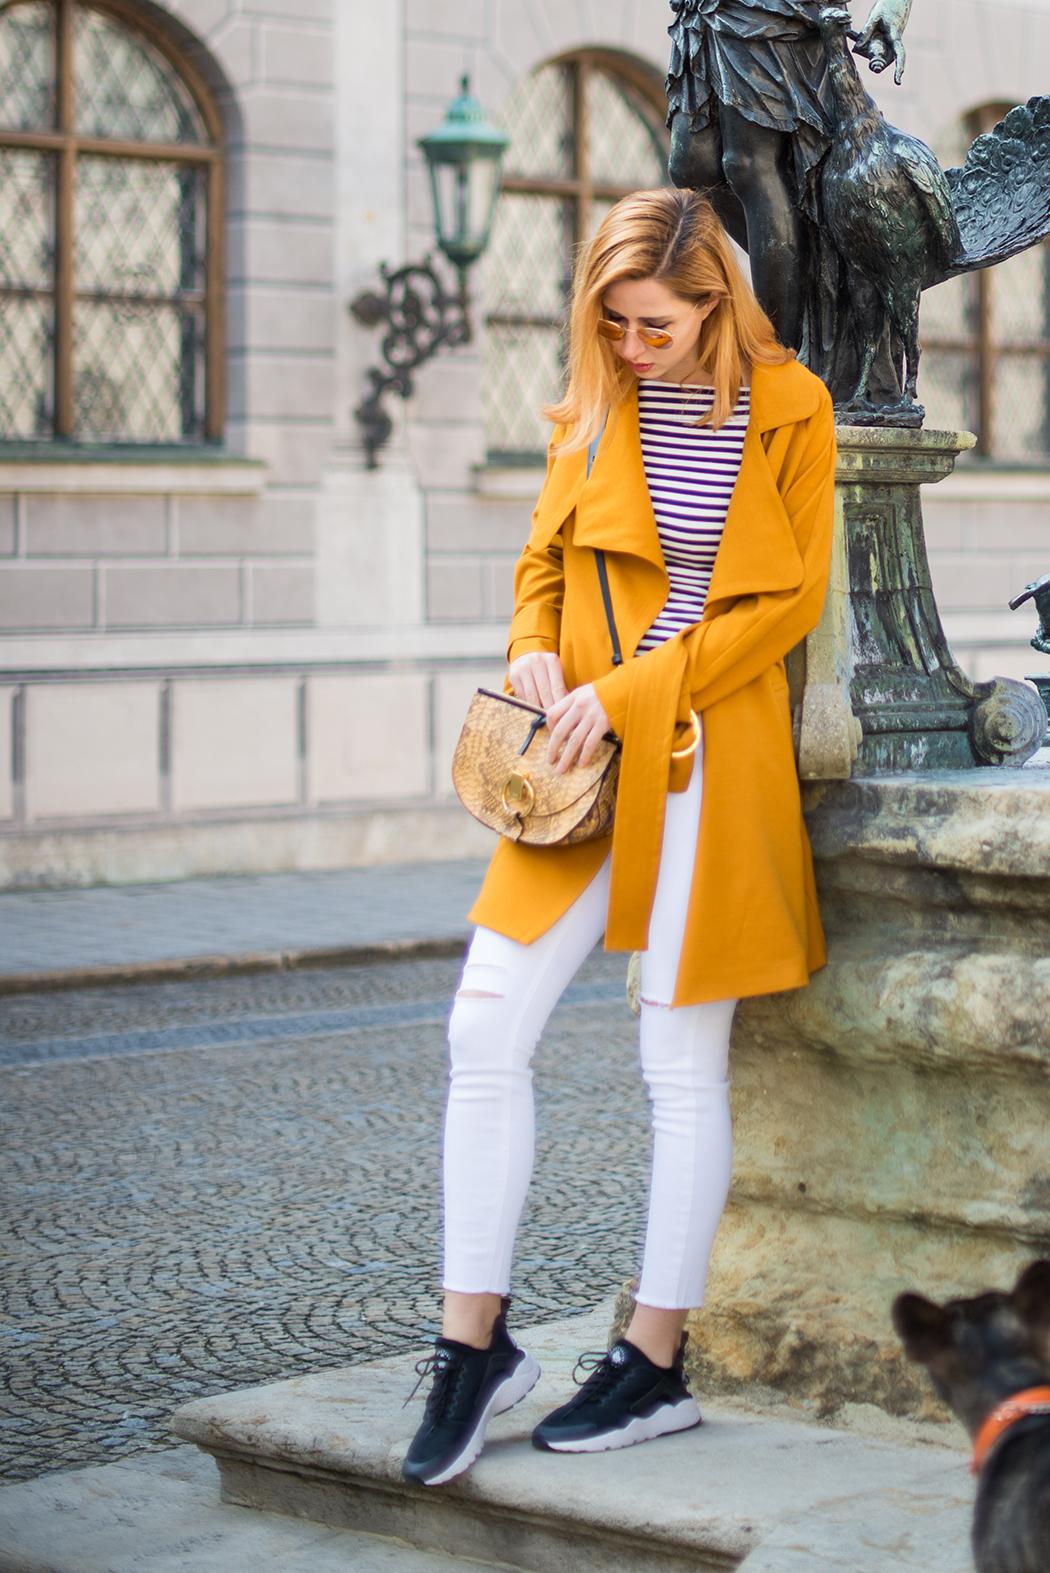 Fashionblog-Fashionblogger-Fashion-Blog-Blogger-Muenchen-Berlin-Edited_the_Label-Chloe_Goldie-Bag-Python-5-web